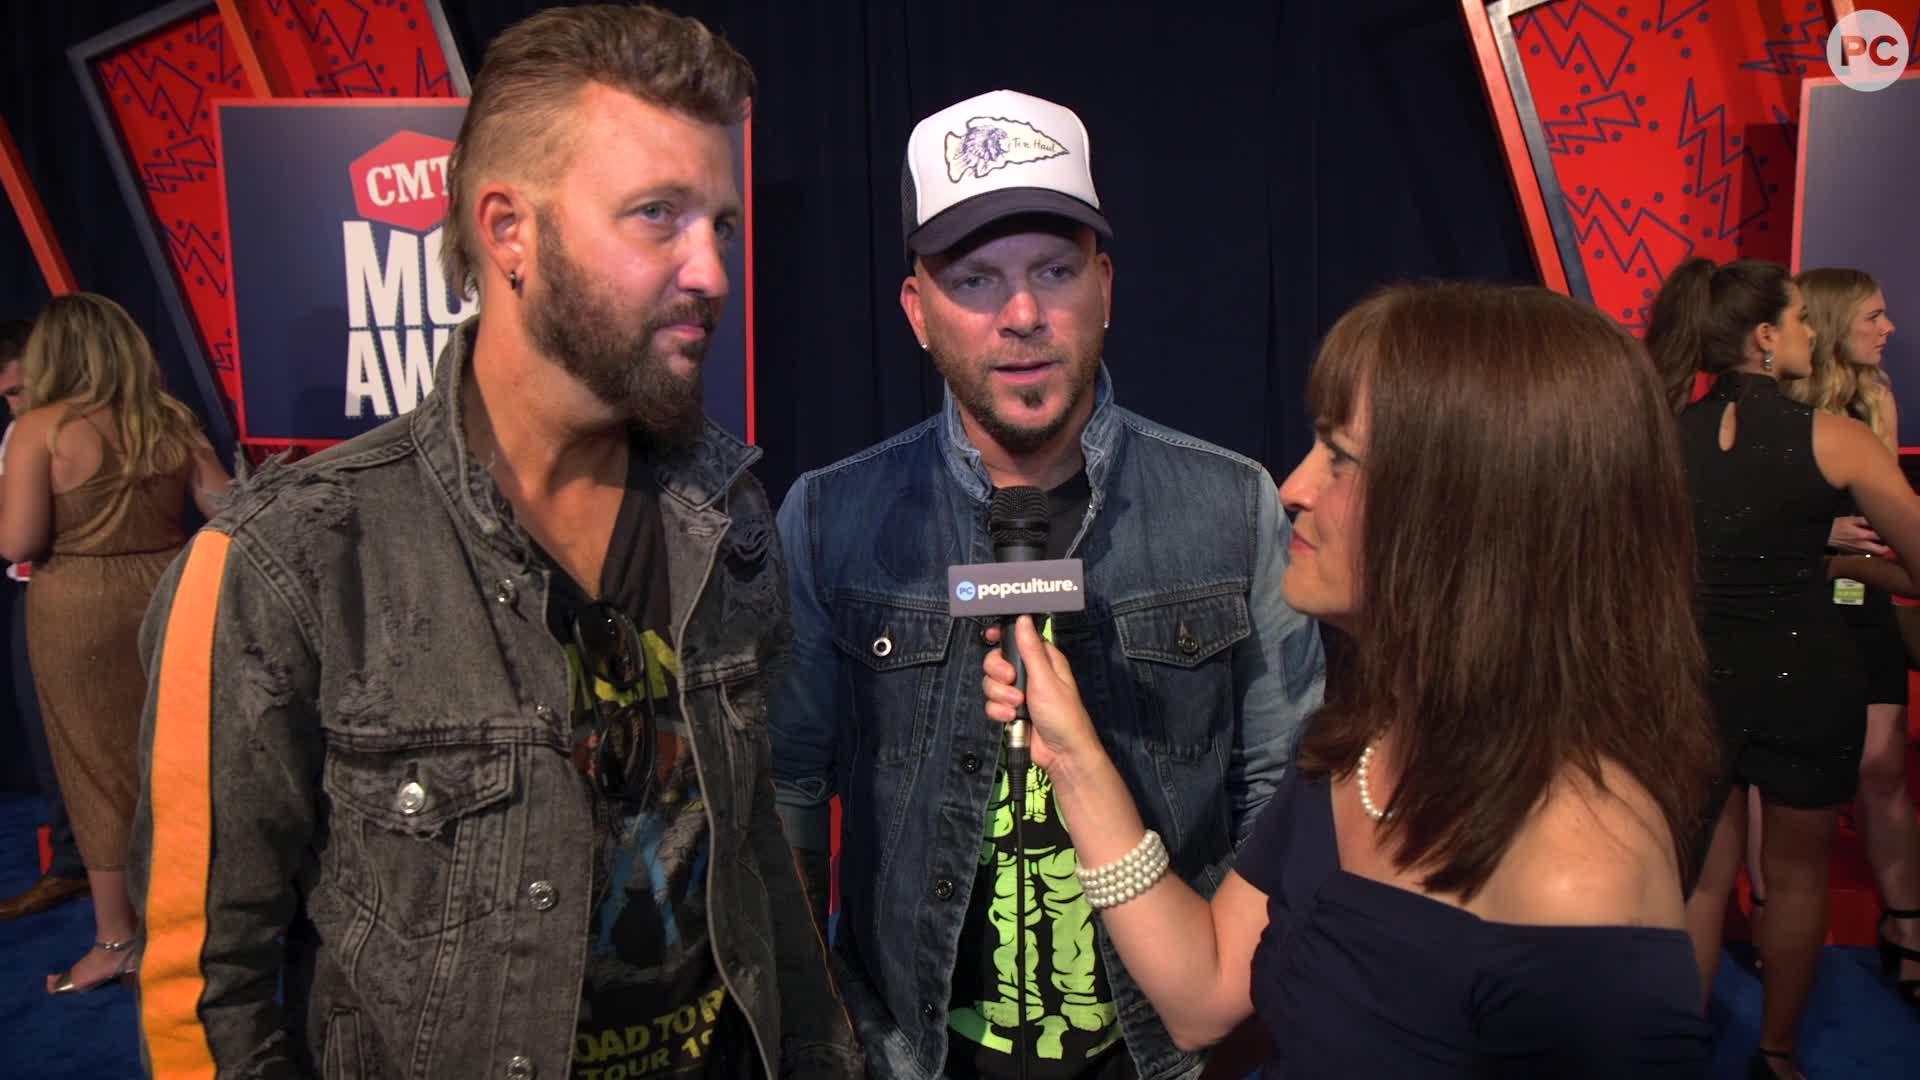 LOCASH - 2019 CMT Awards Red Carpet Exclusive screen capture